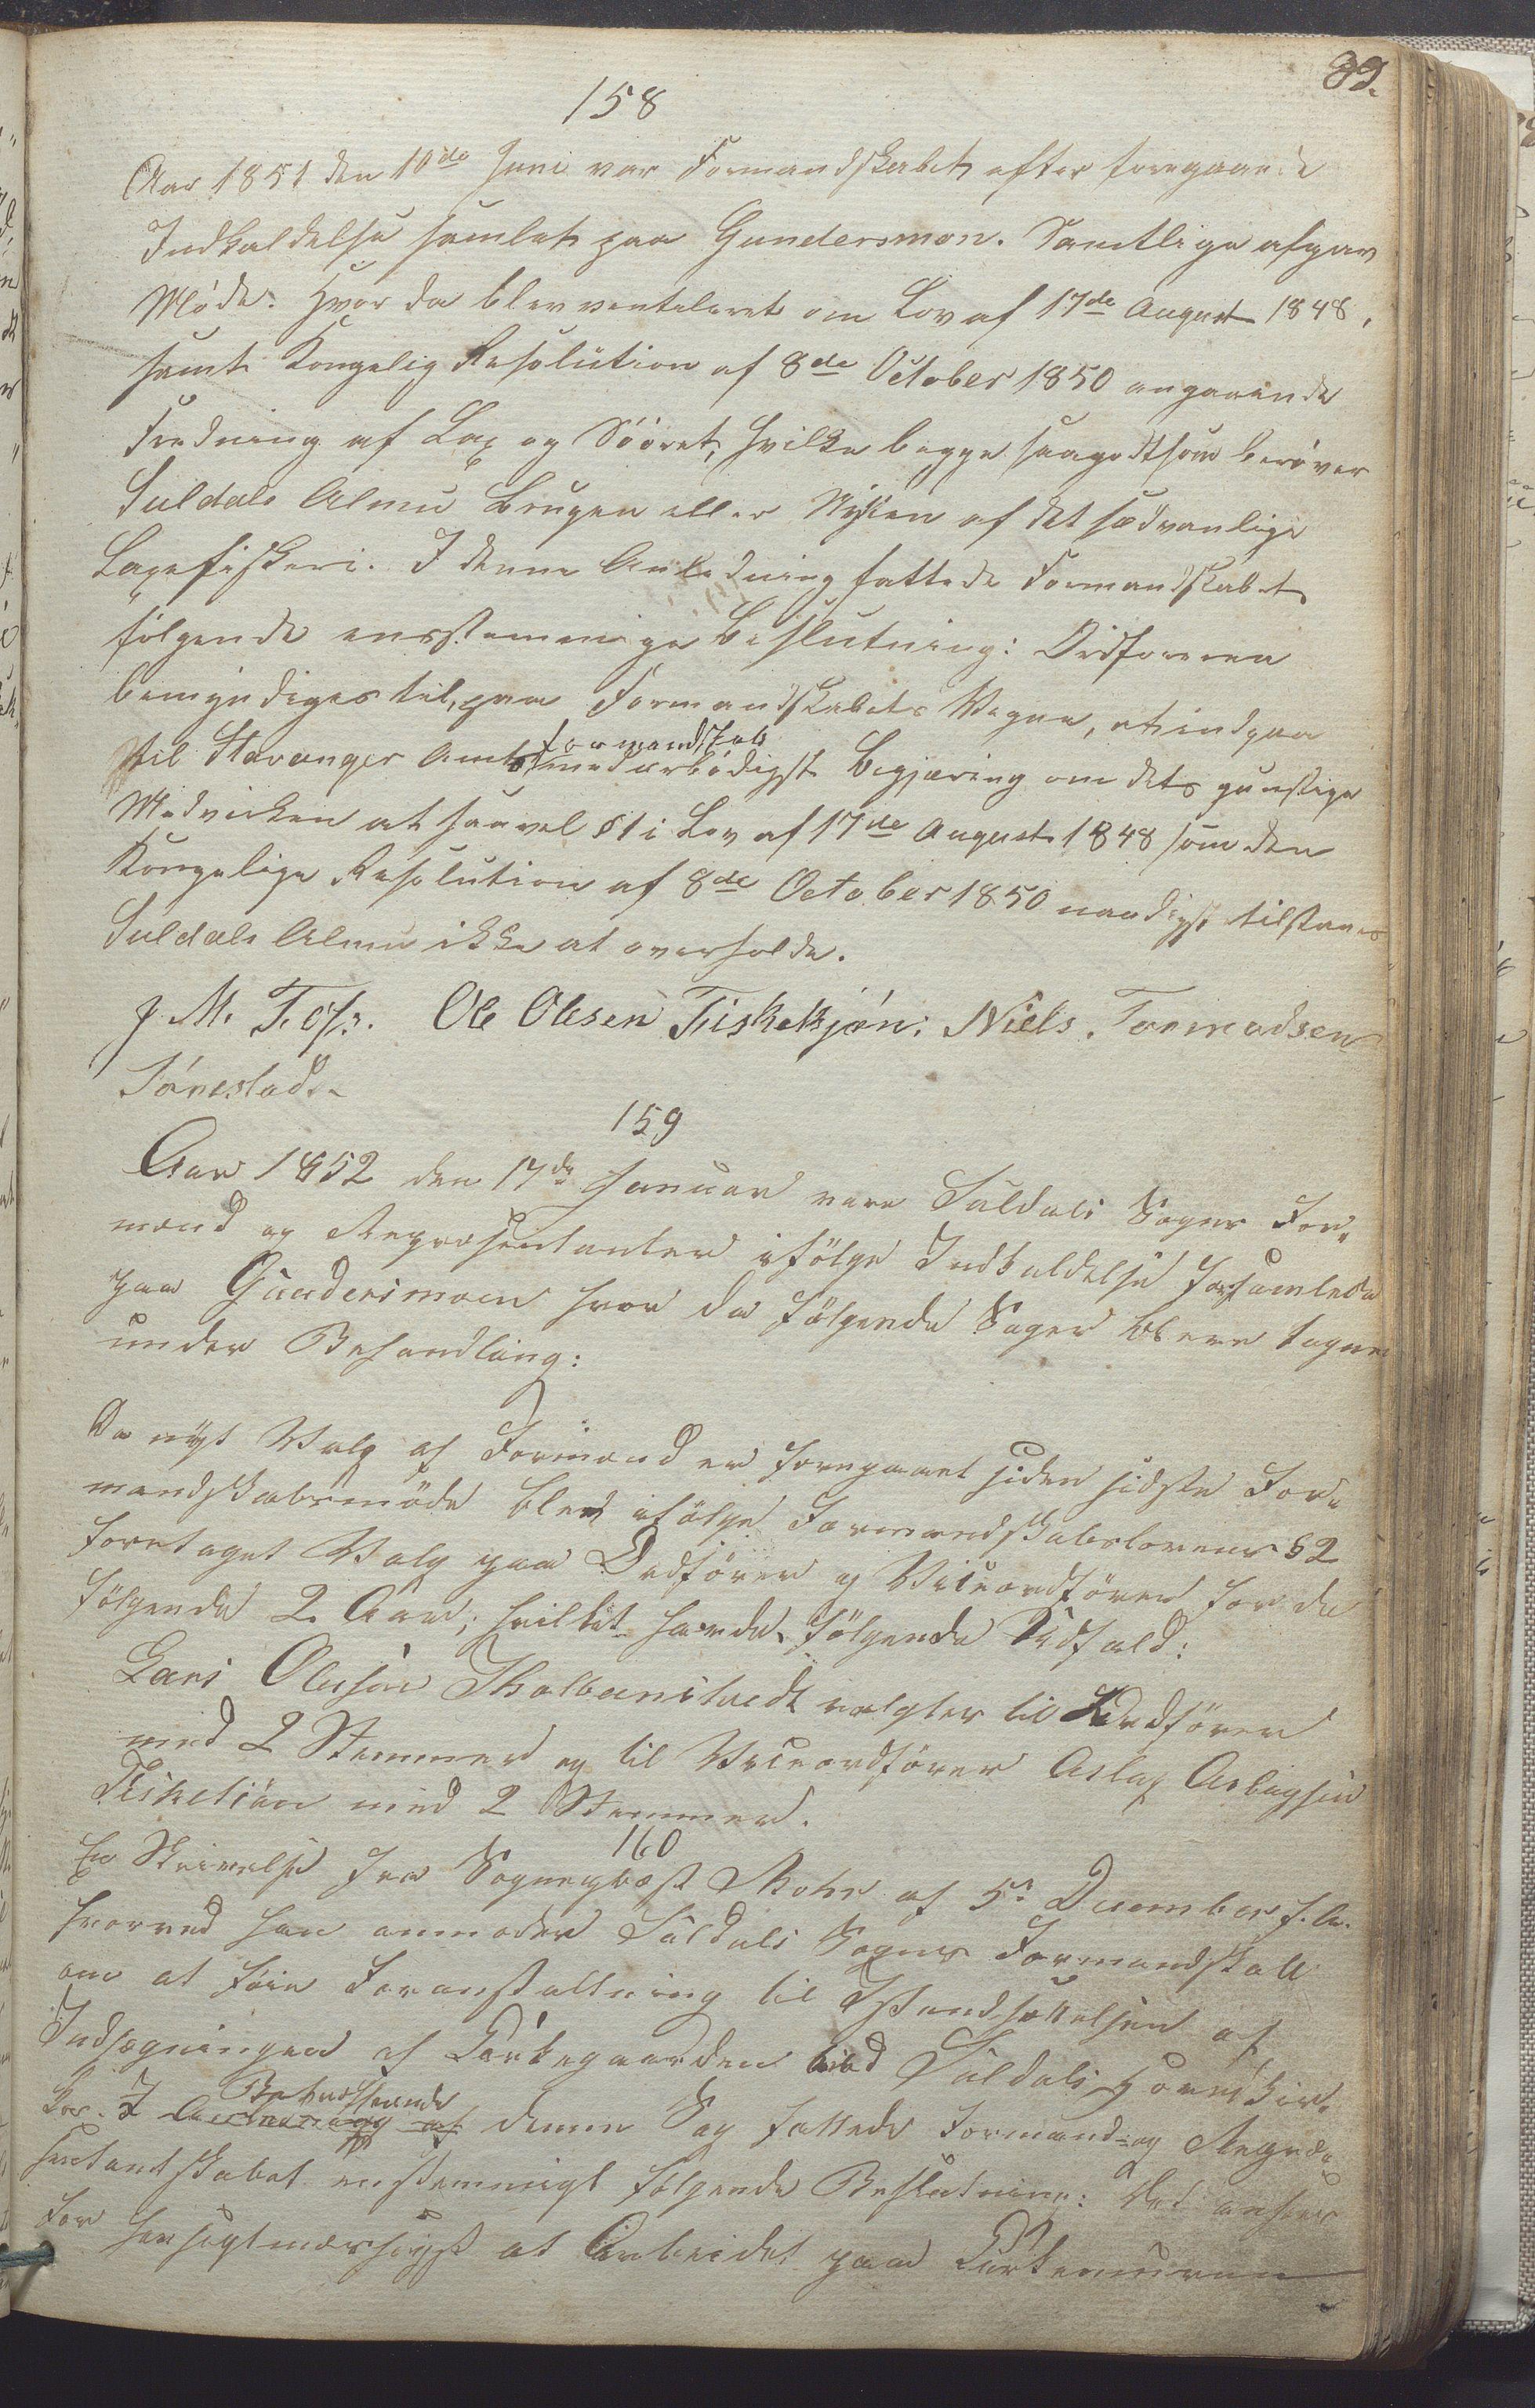 IKAR, Suldal kommune - Formannskapet/Rådmannen, A/Aa/L0001: Møtebok, 1837-1876, s. 89a